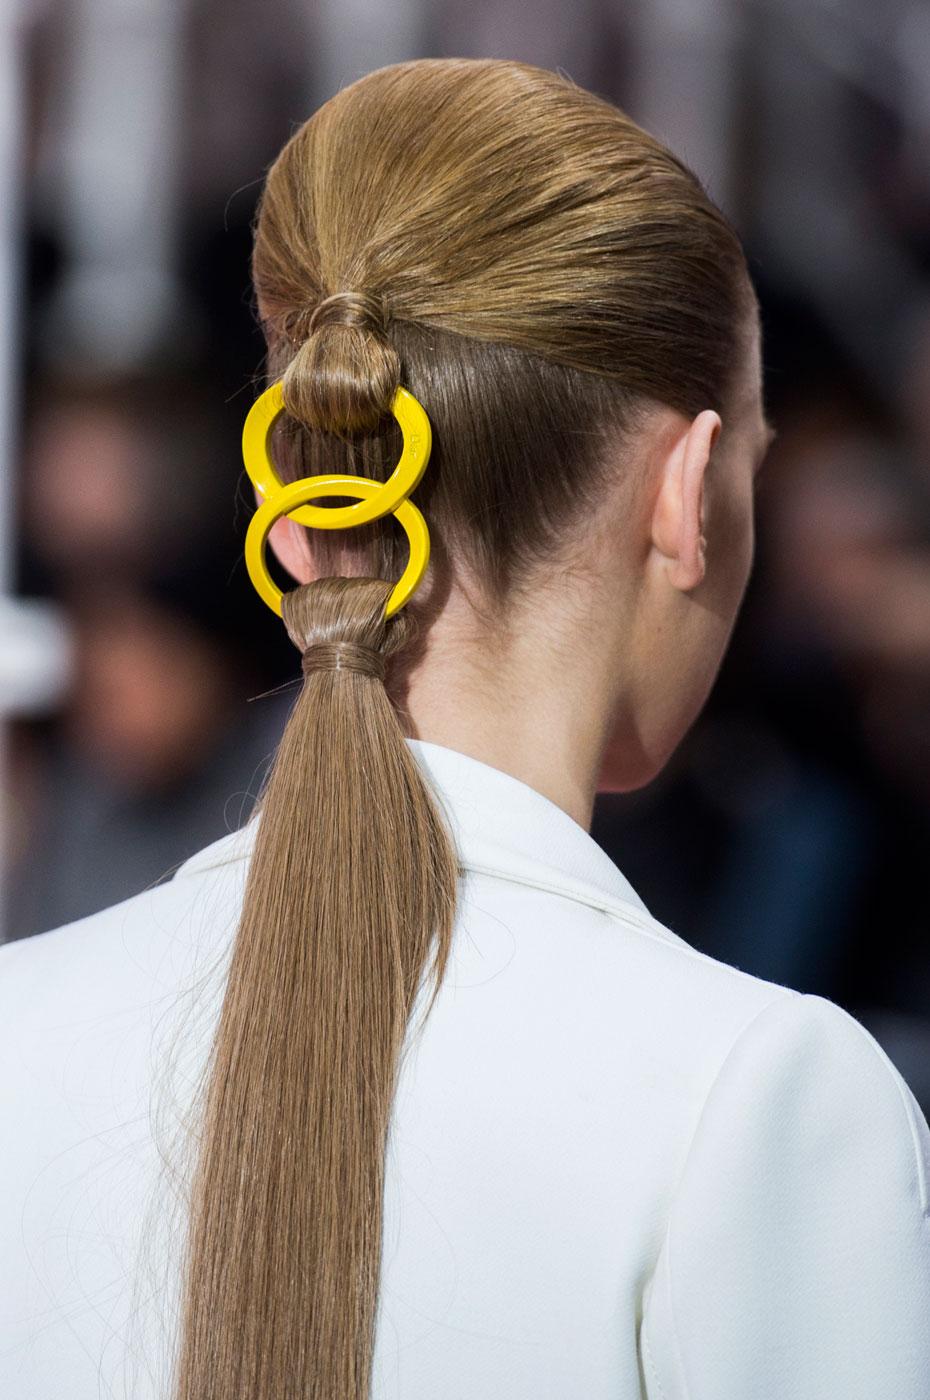 Christian-Dior-fashion-runway-show-close-ups-haute-couture-paris-spring-summer-2015-the-impression-195